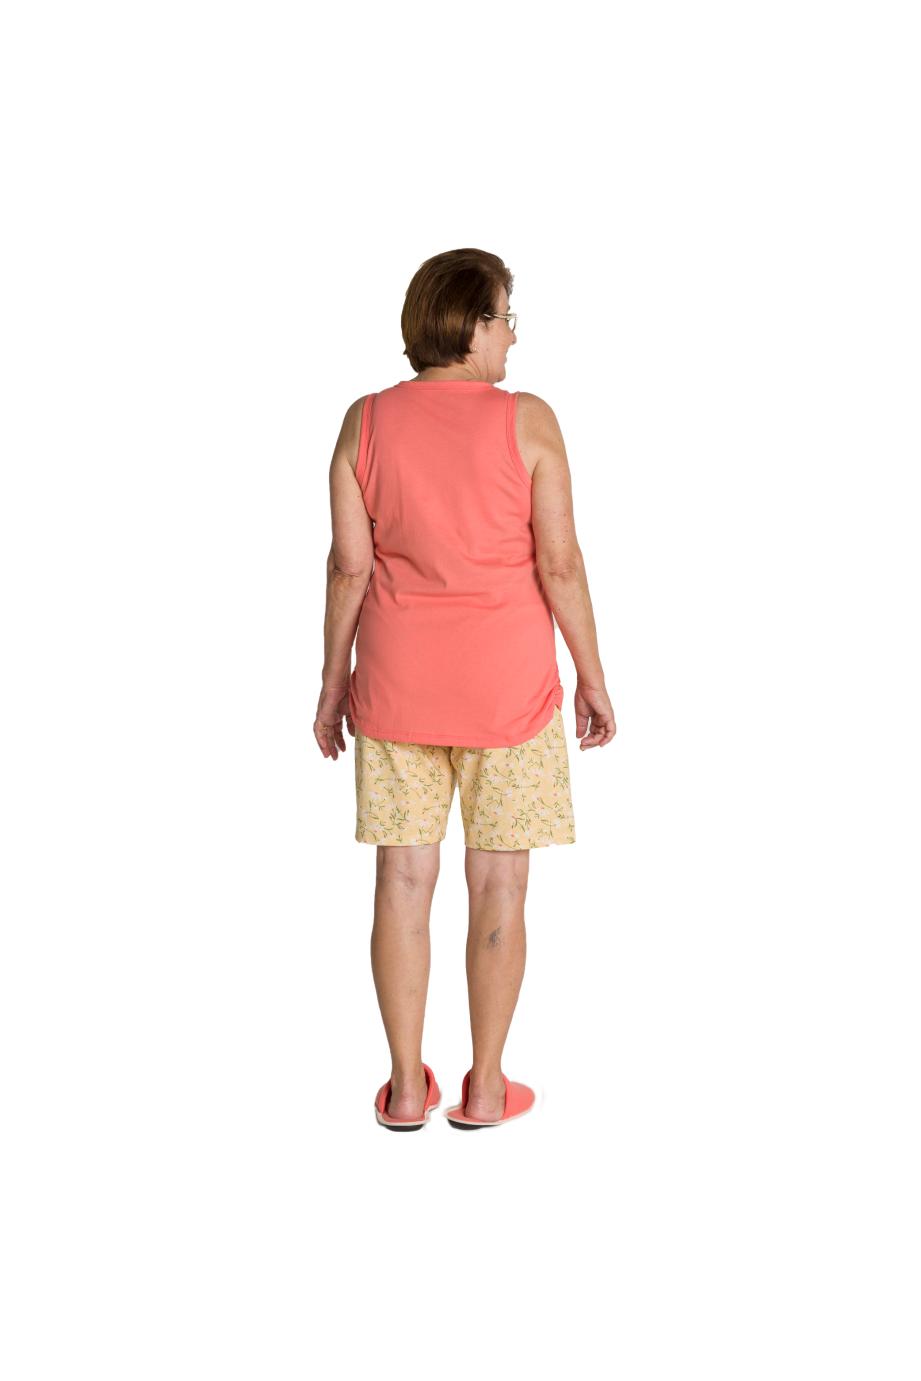 043/C - Pijama Adulto Feminino Regata Básica Short Estampa de Margarida